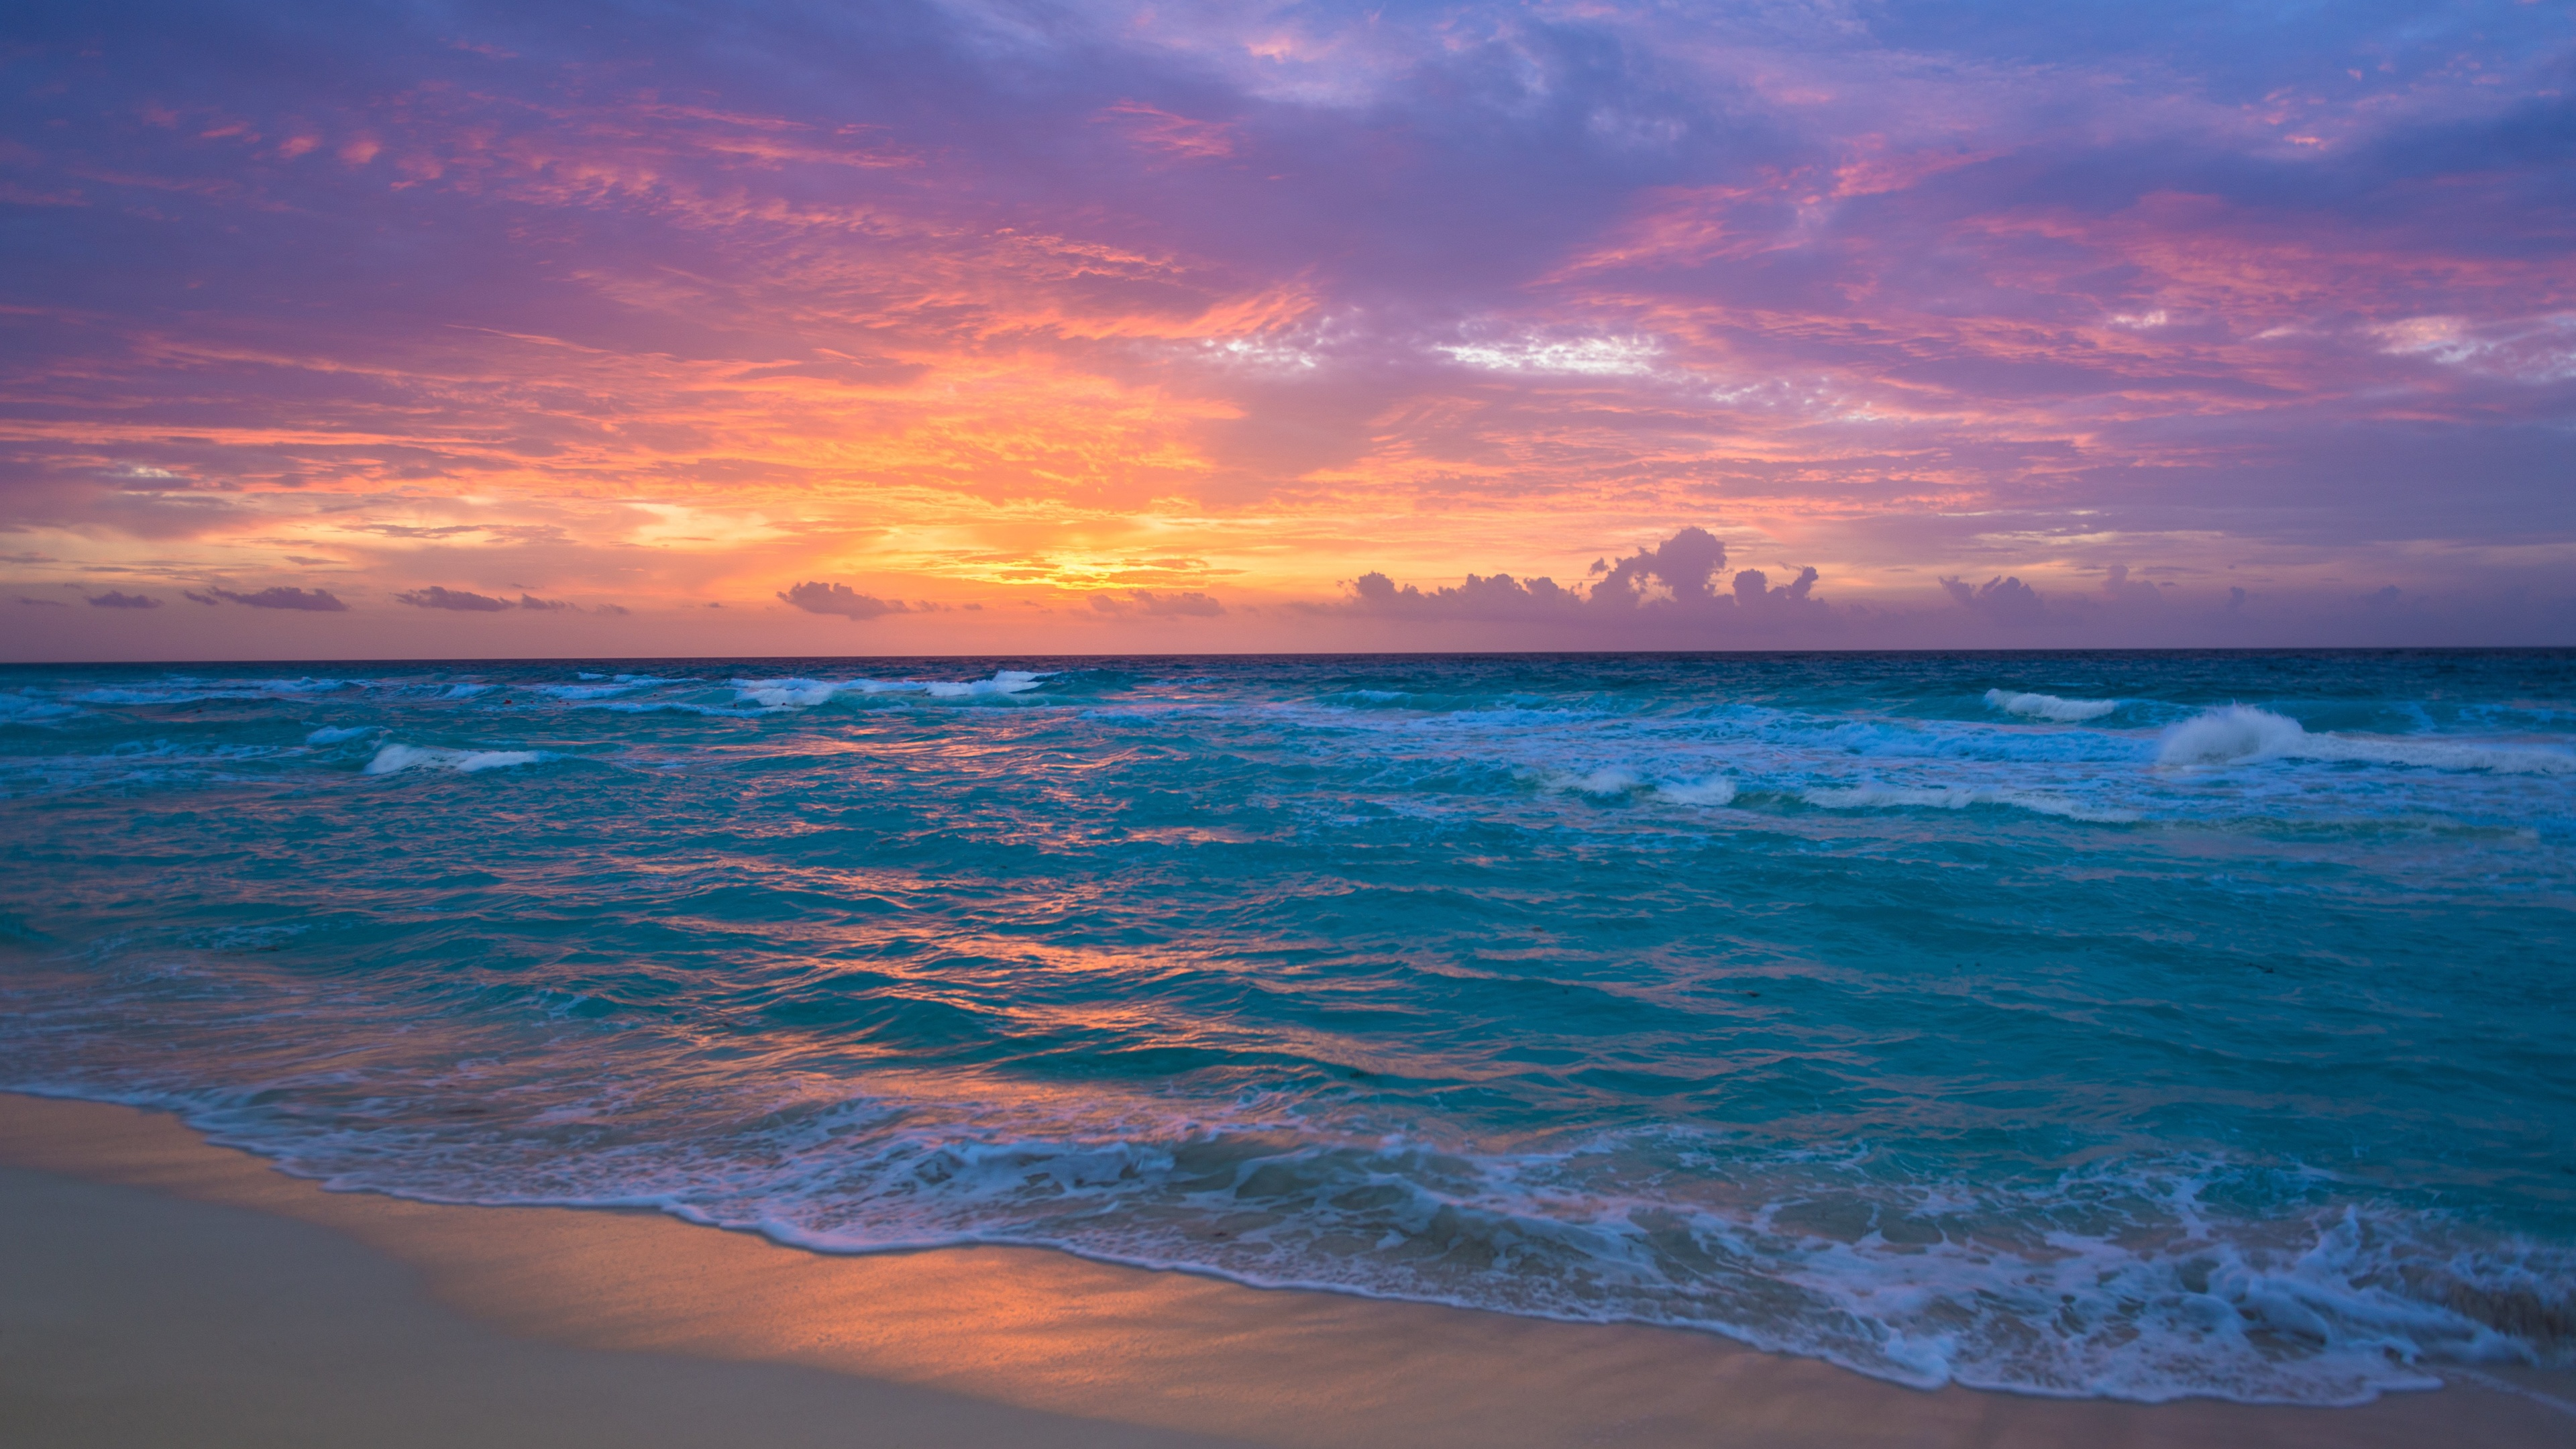 Waves ocean beach Ultra HD 4k Wallpaper   HD Wallpapers Ultra HD 3840x2160